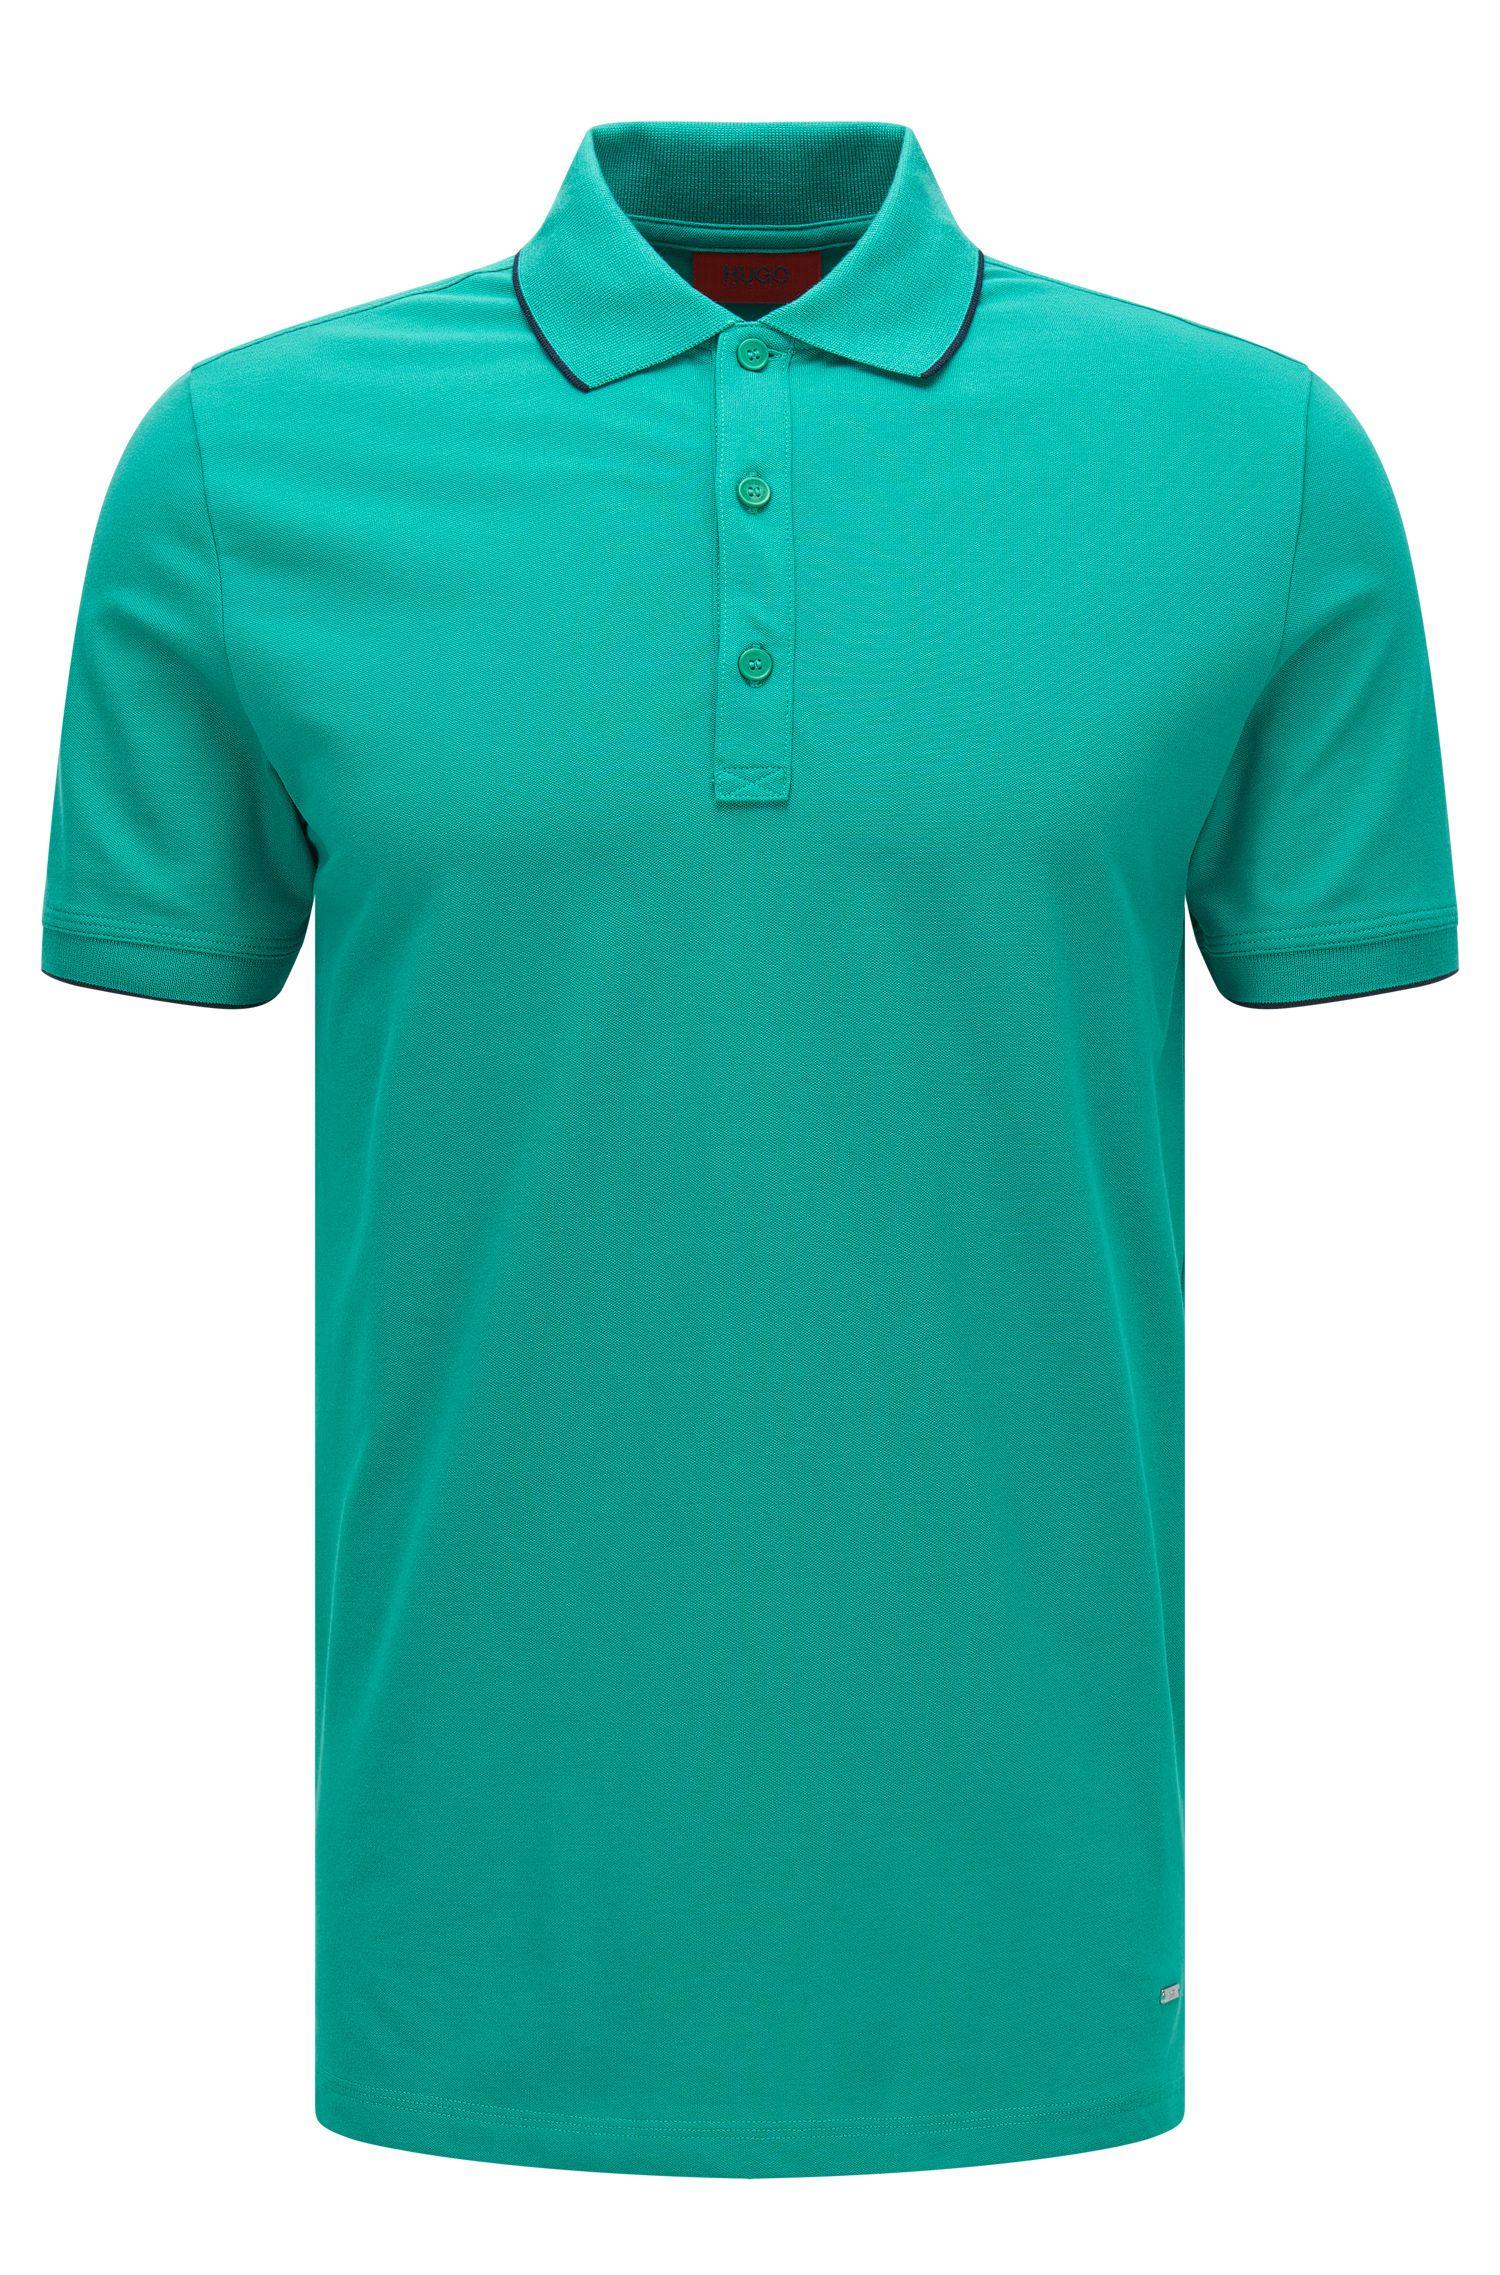 'Delorian'   Slim Fit, Stretch Cotton Polo Shirt